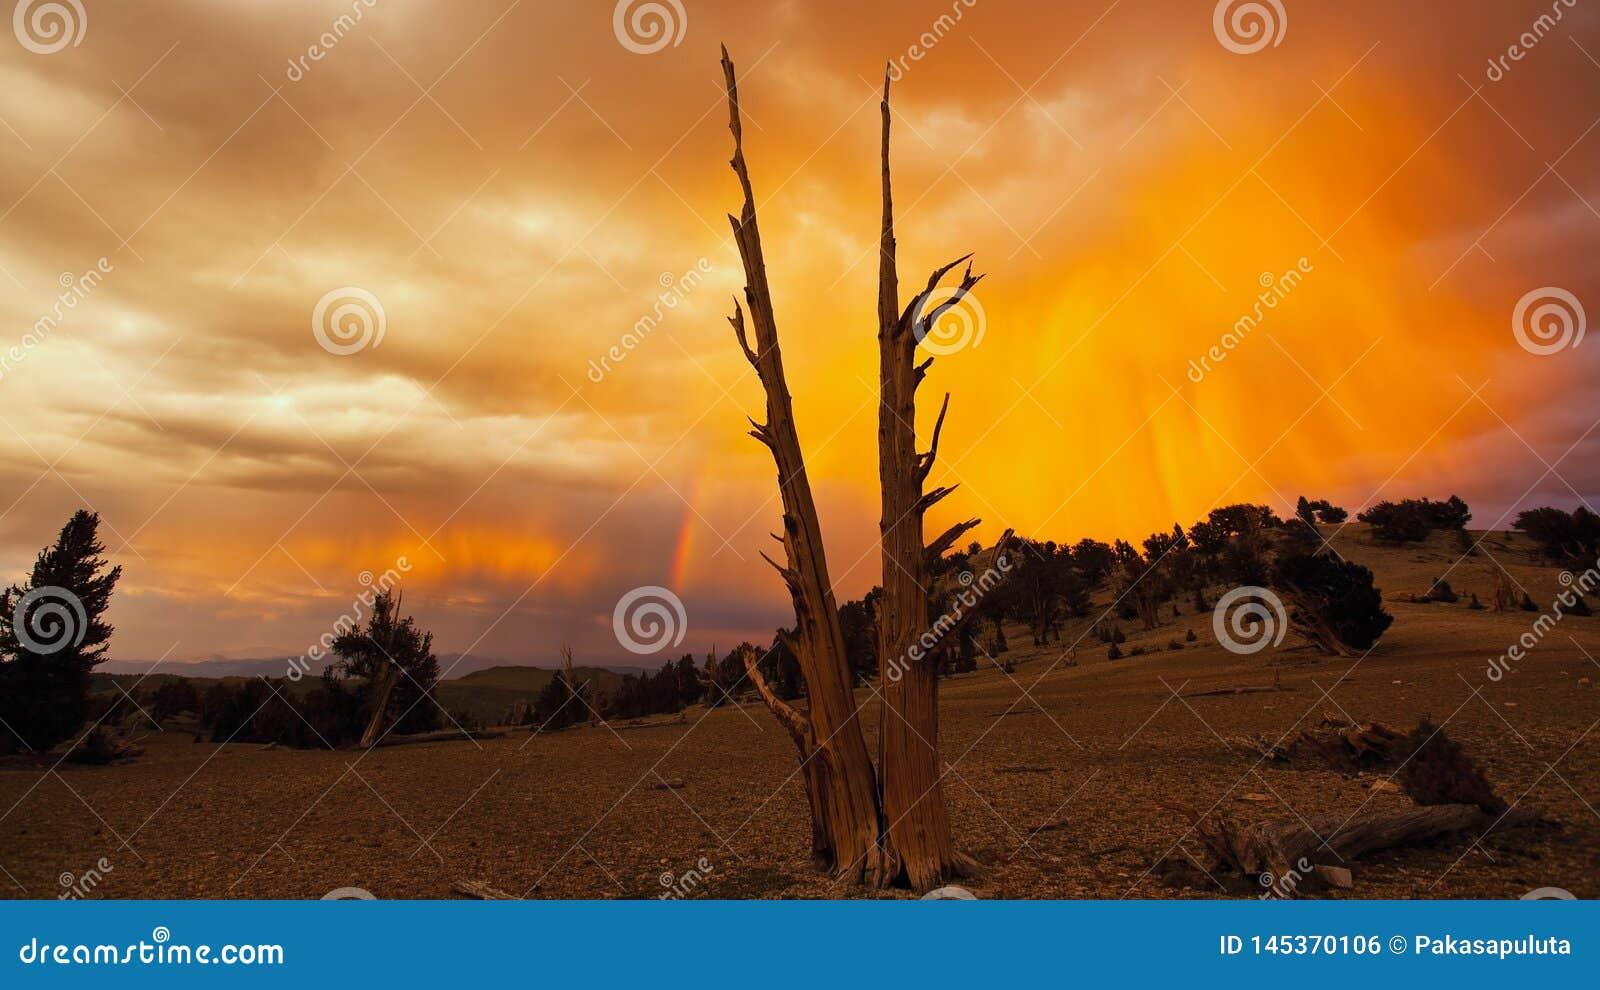 Volcano Desert and Trees